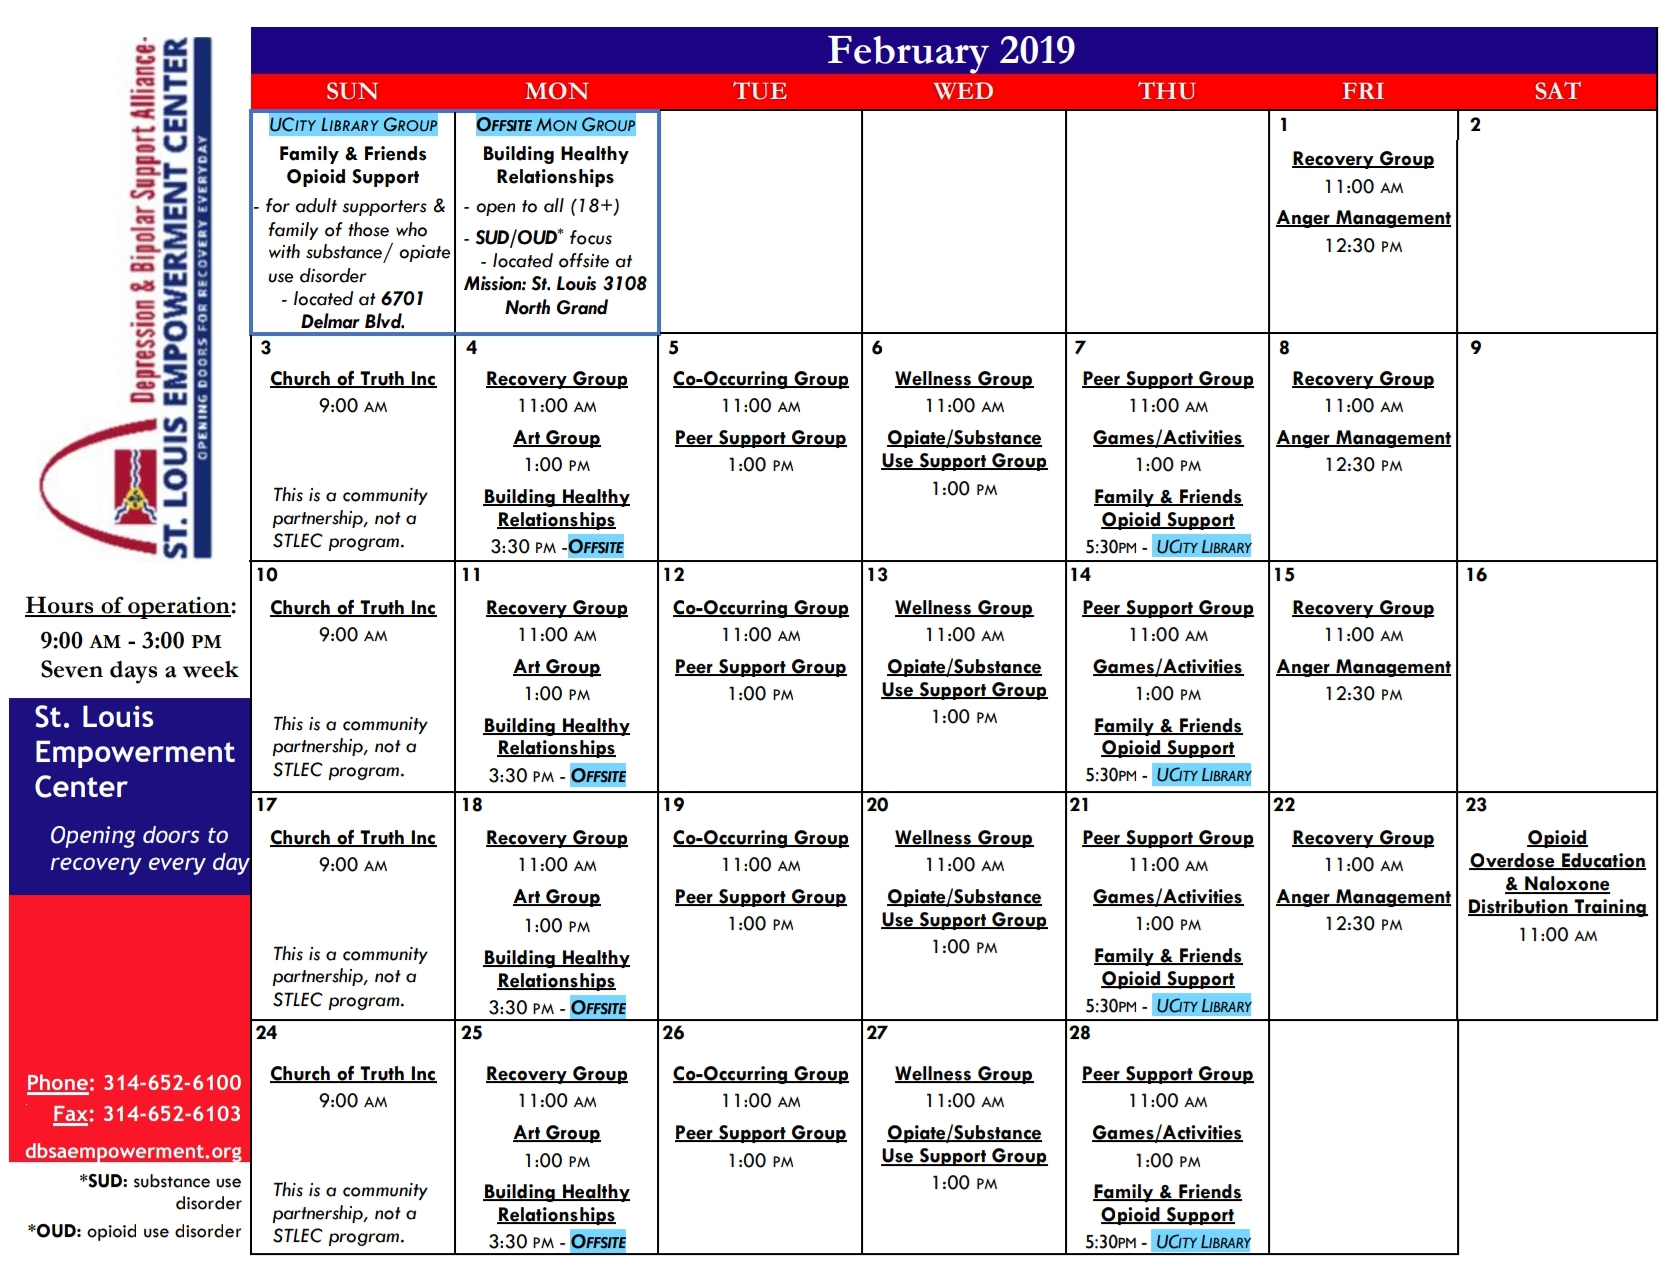 Calendar Feb 2019.Stlec Rcc Calendar Feb 2019 V2